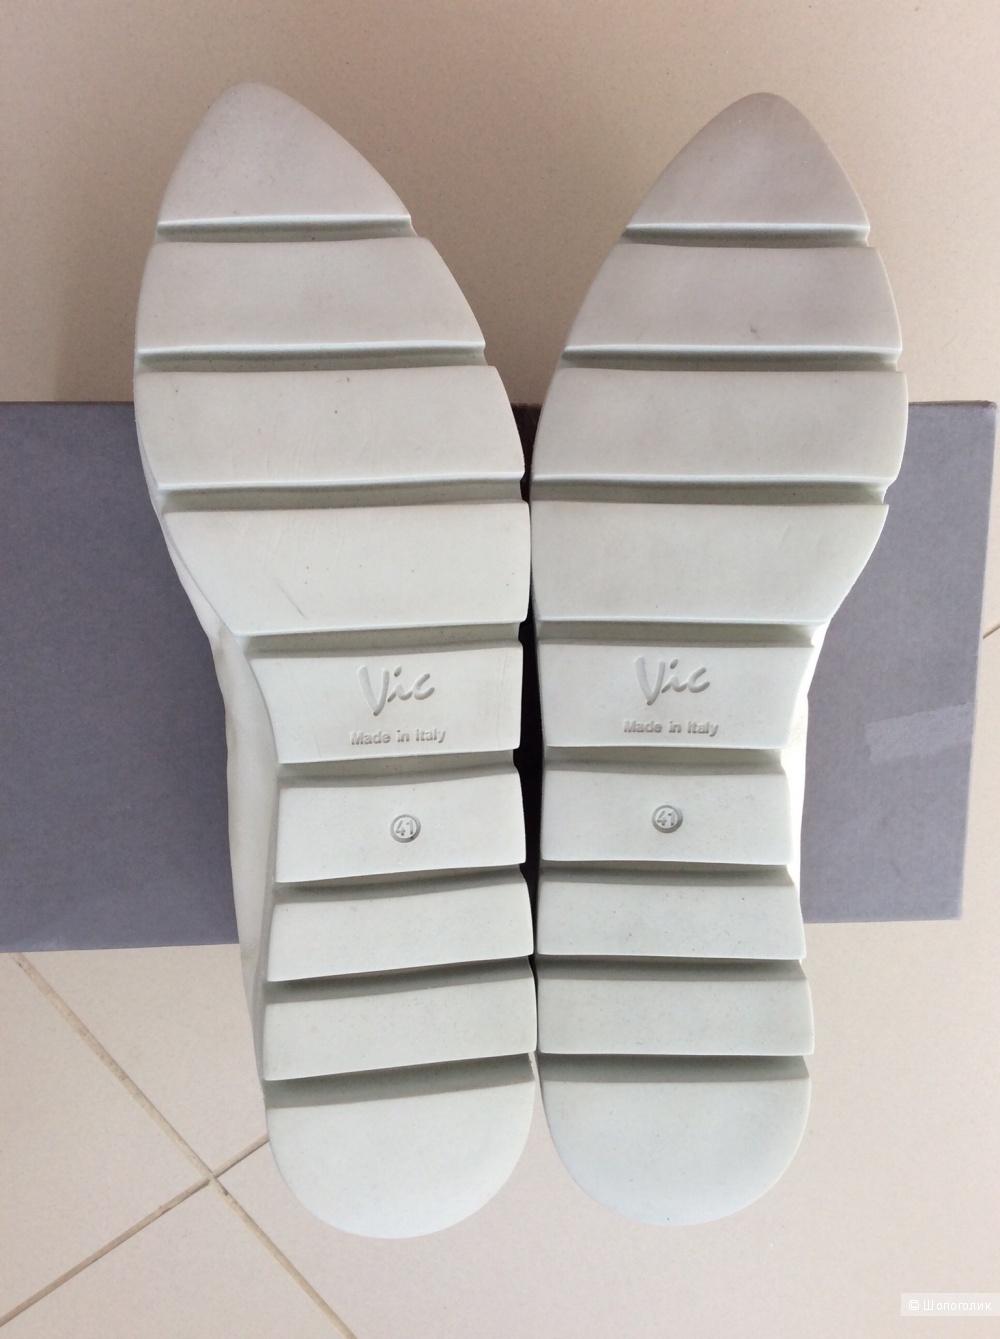 Туфли-балетки VIC р.41 (маломерки, на стопу 25 -25,5 см)